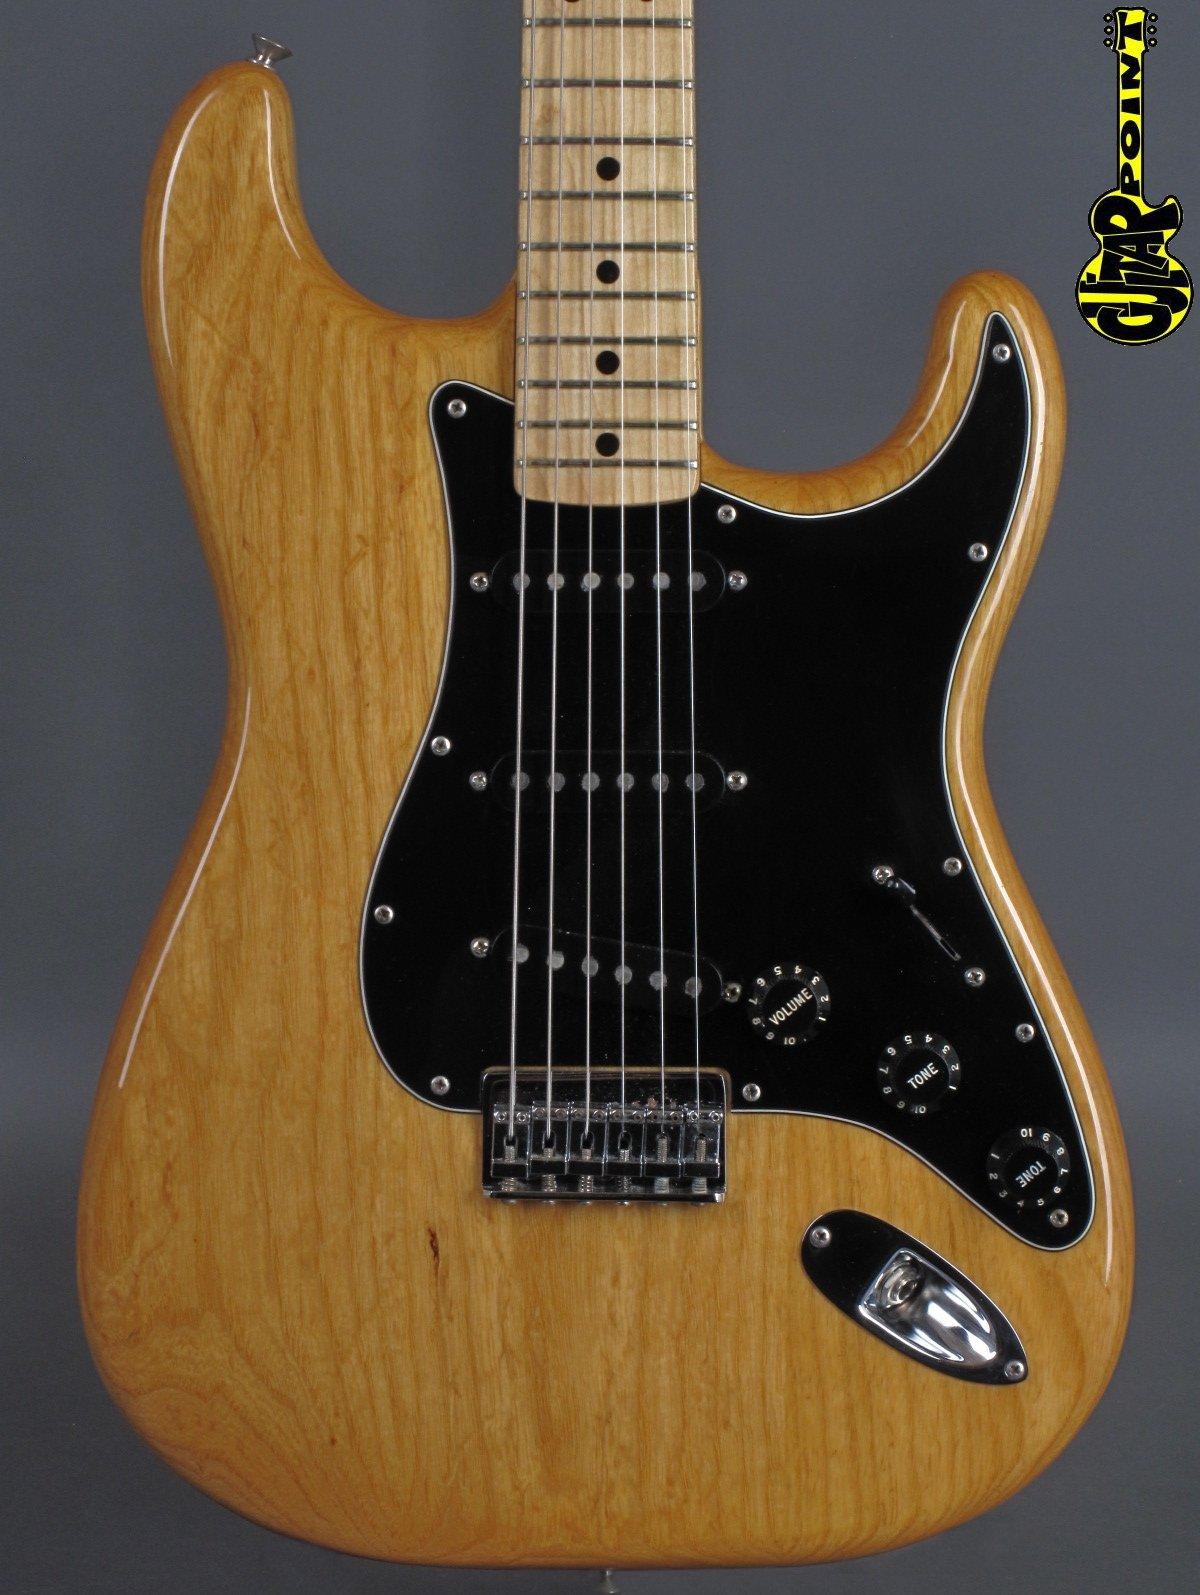 1979 Fender Stratocaster - Natural    ...minty !!!